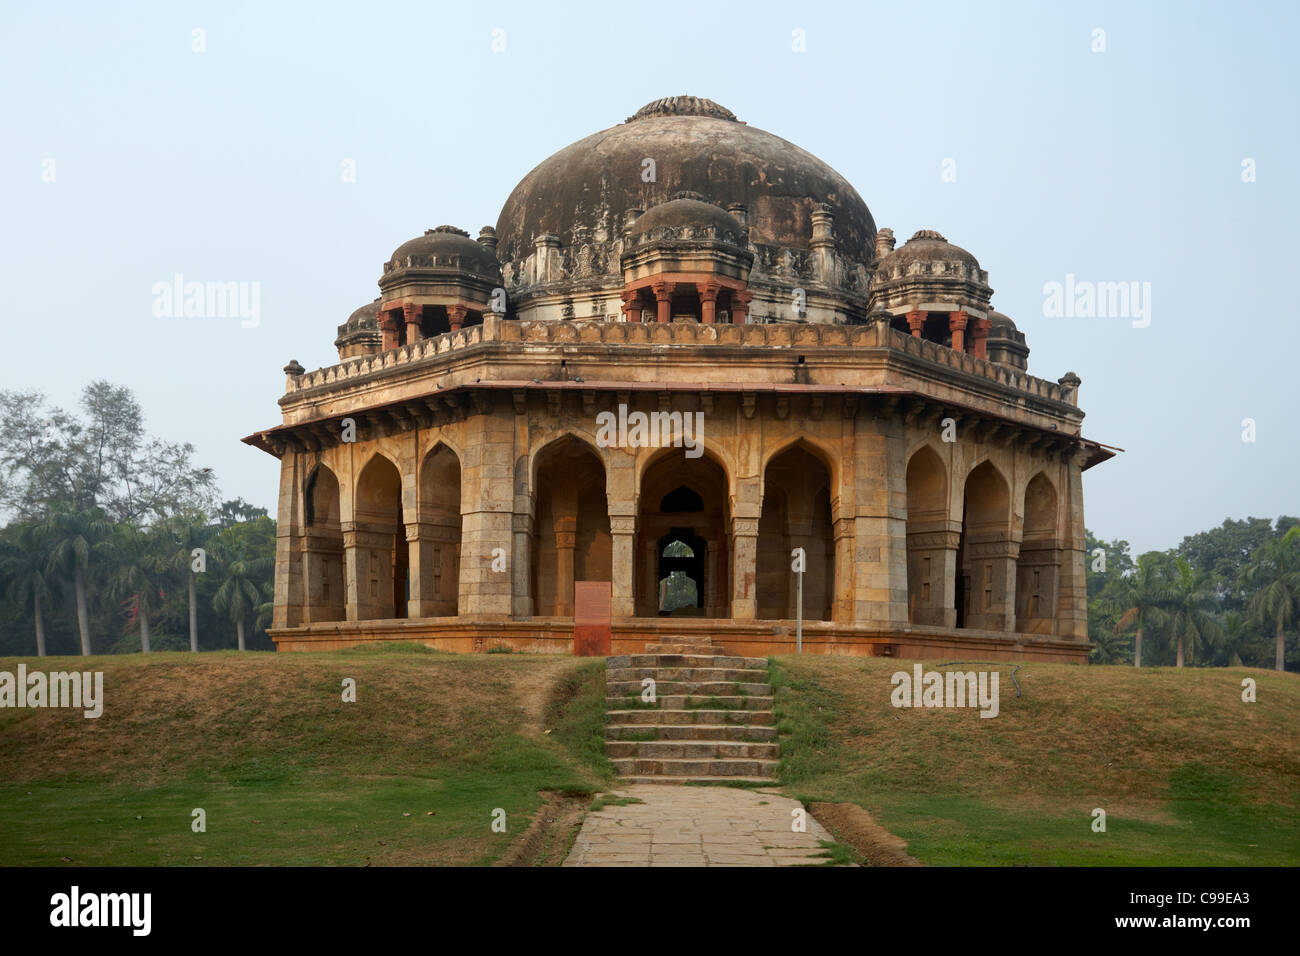 Muhammad Shah Lodi's Tomb, Lodi Gardens, New Delhi, India - Stock Image